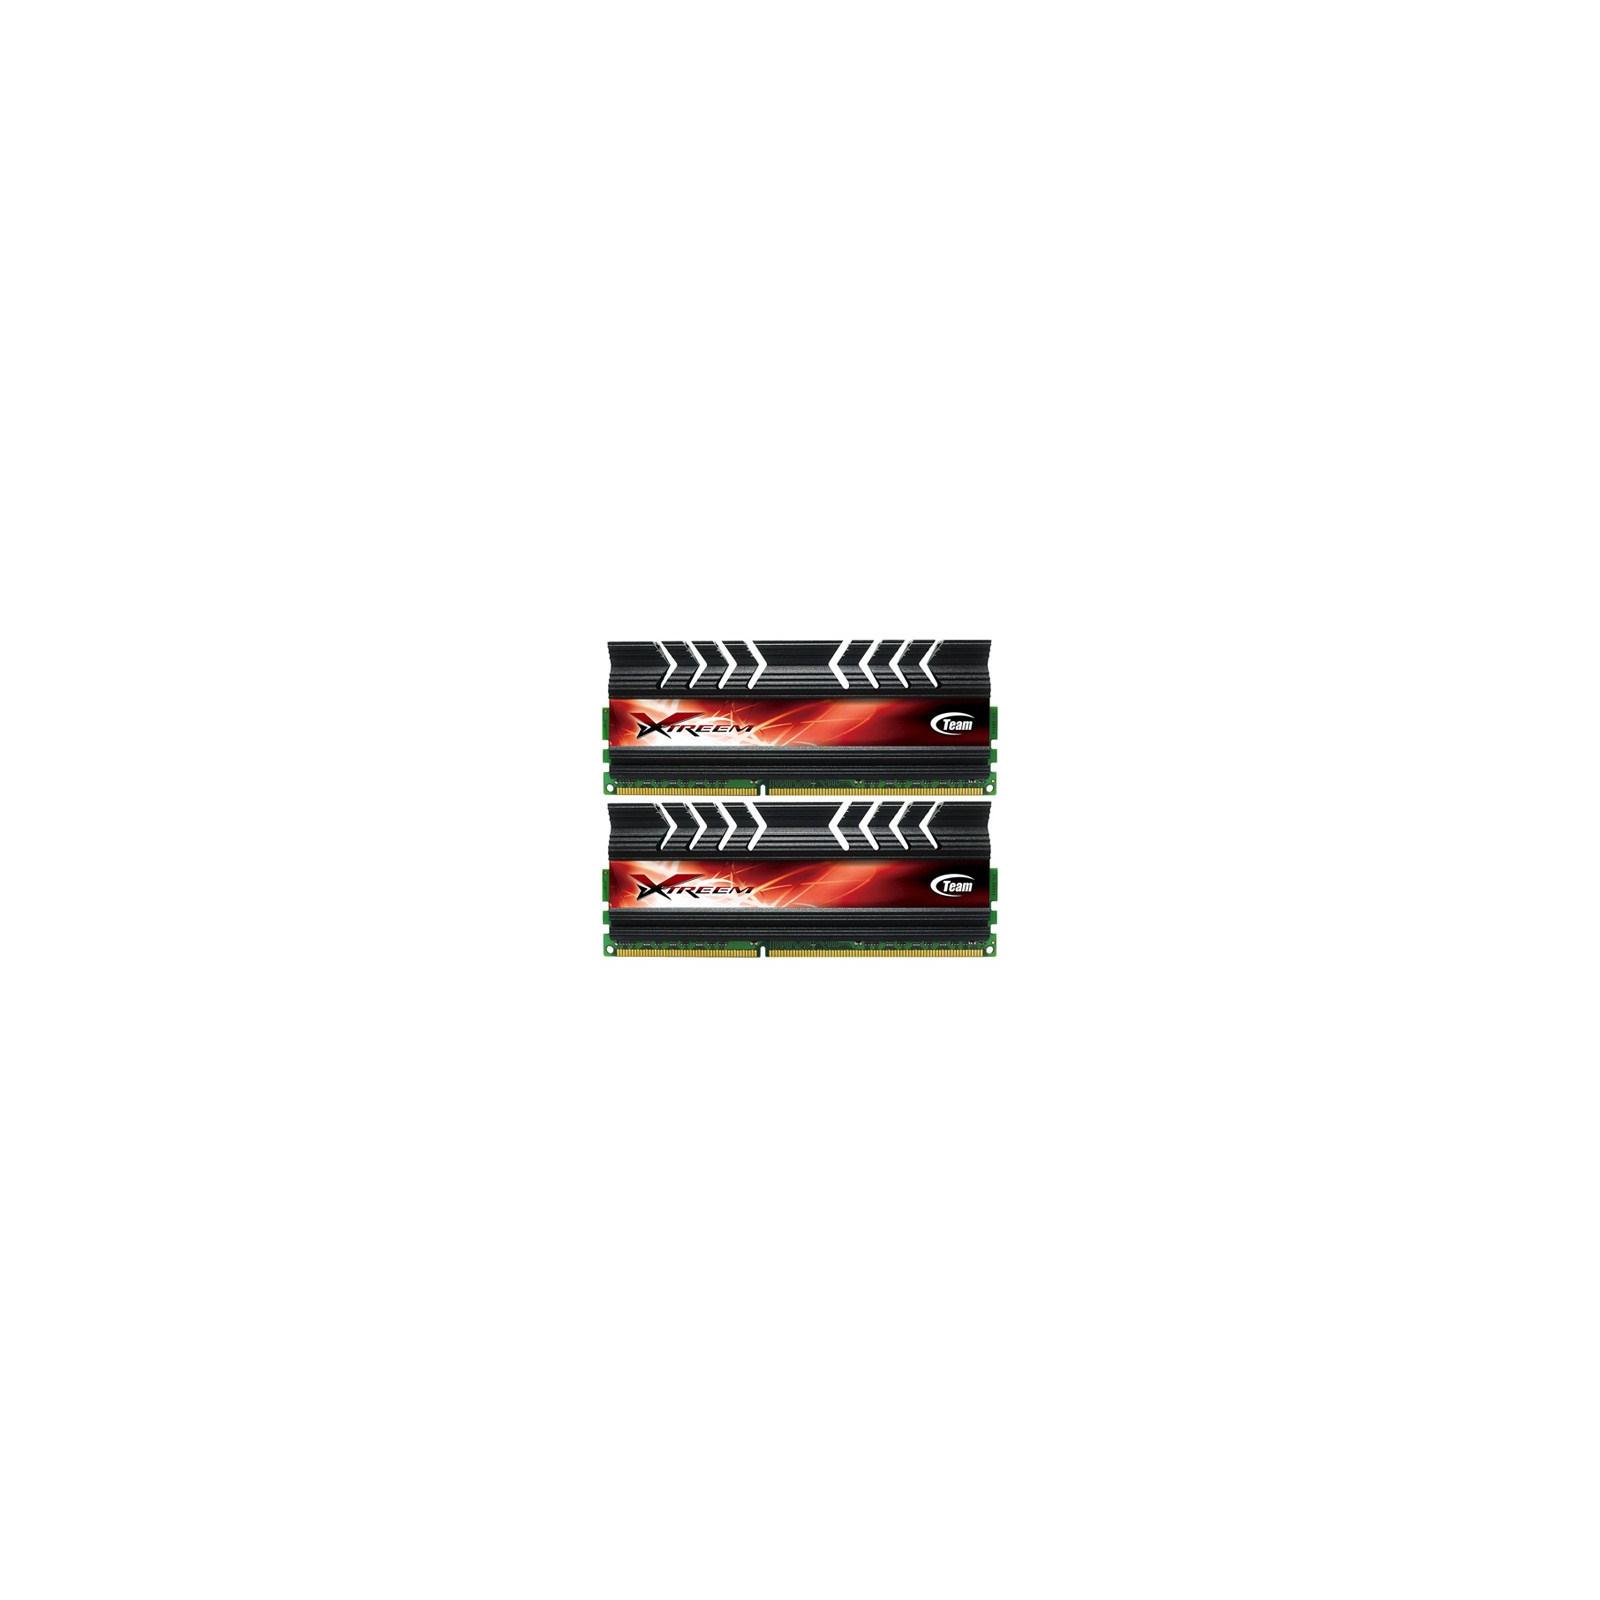 Модуль памяти для компьютера DDR3 16GB (2x8GB) 2400 MHz Team (TXD316G2400HC10QDC01)